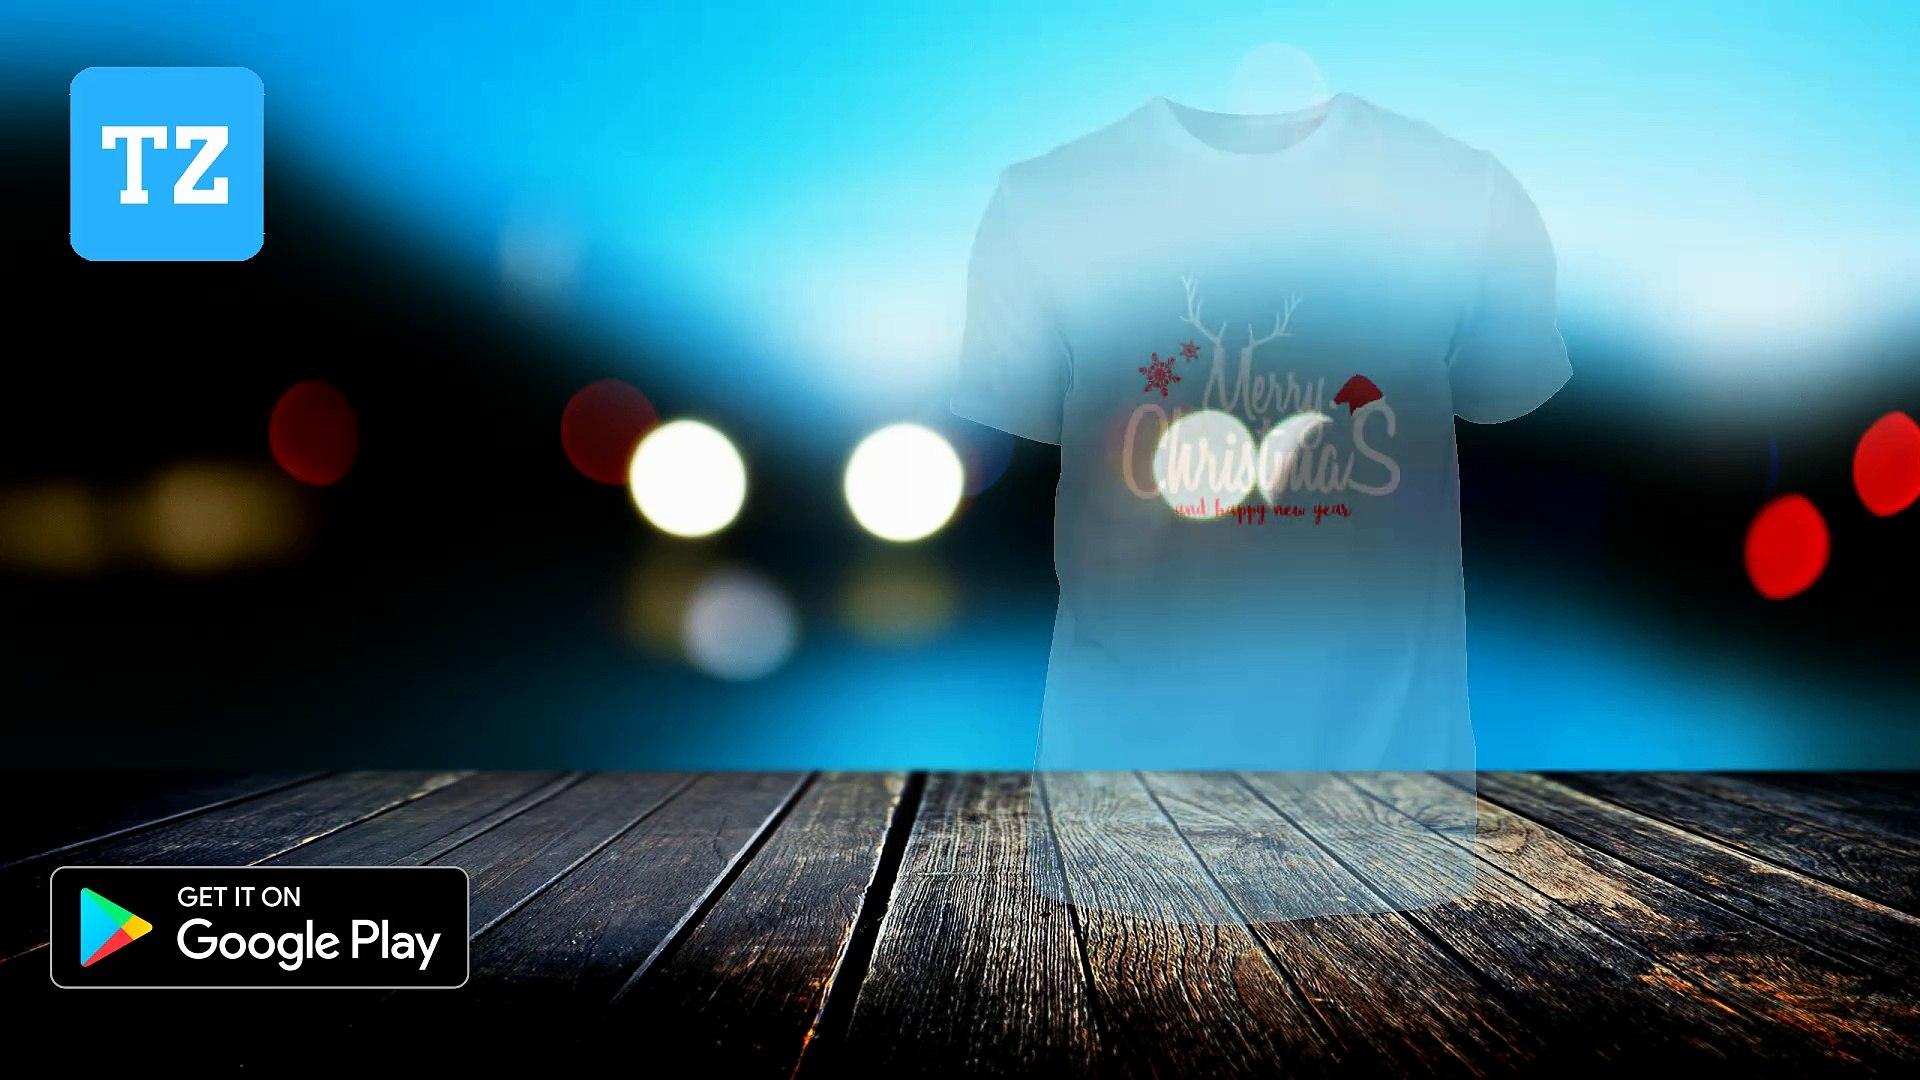 Merry Christmas Happy New Year  - Teezilla tshirt store google play Gift